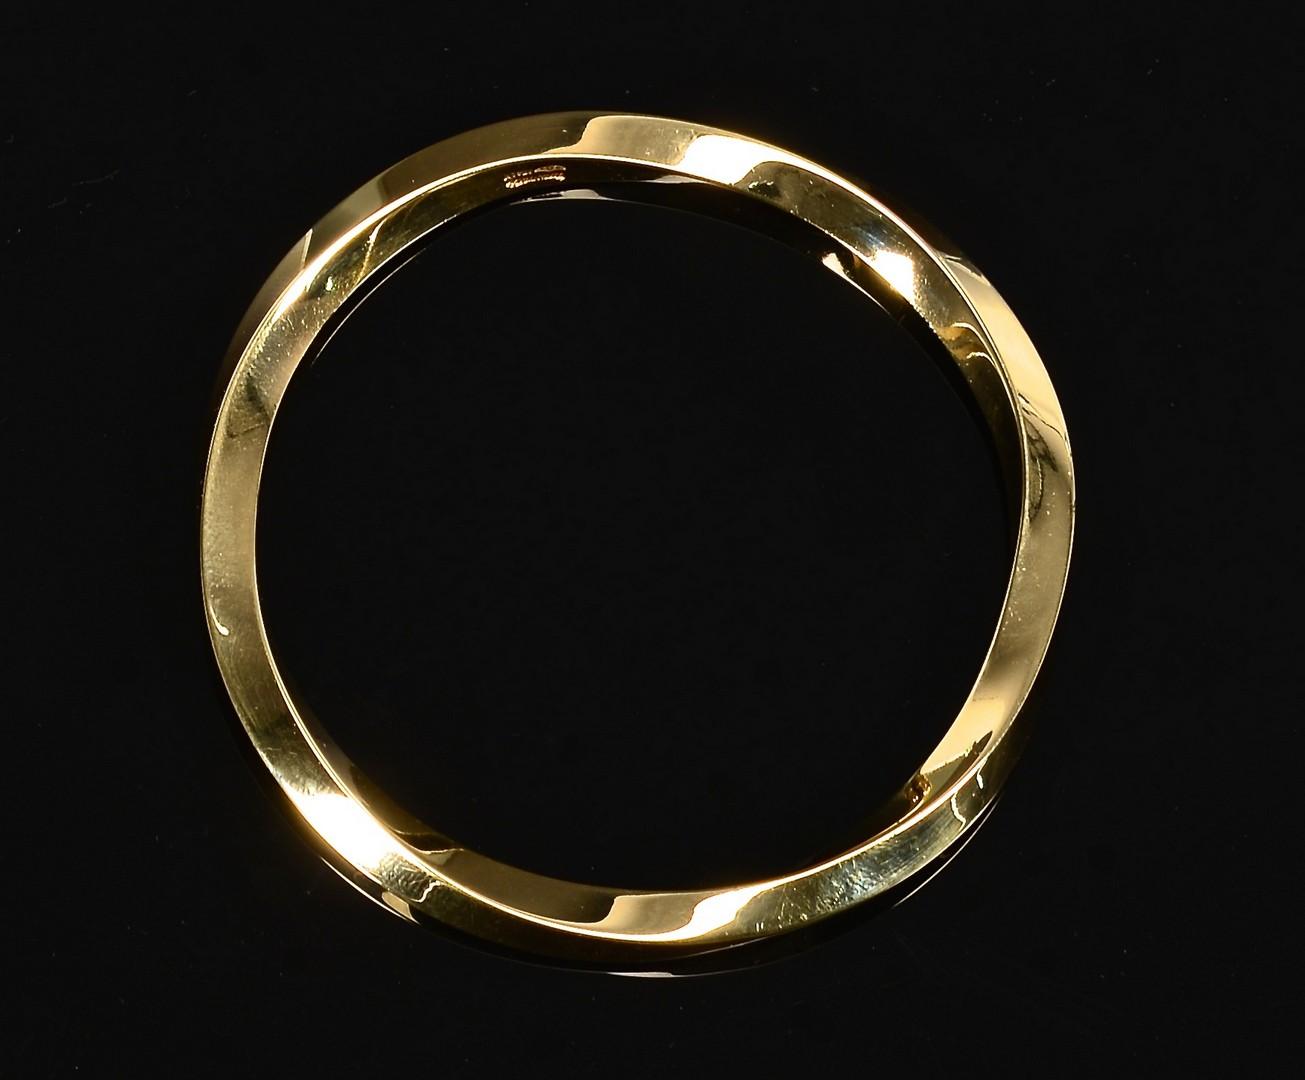 Lot 87: 18k Tiffany Twist Bangle Bracelet